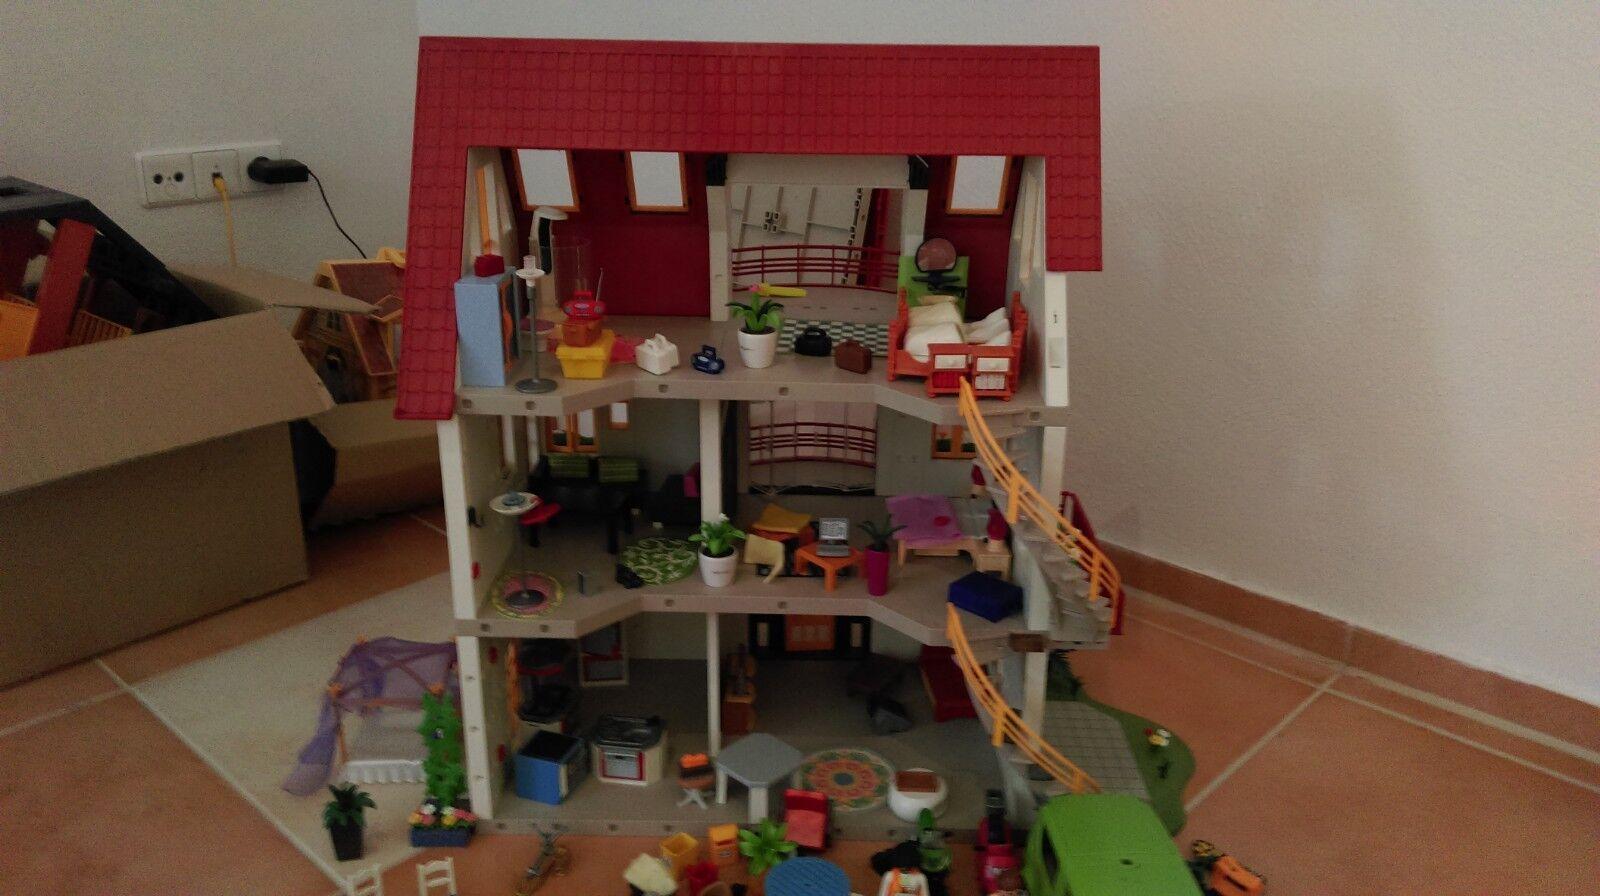 Playmobil Konvolut-Hochzeitslimousine  Wohnhaus Yacht Hotdog Asia Burg